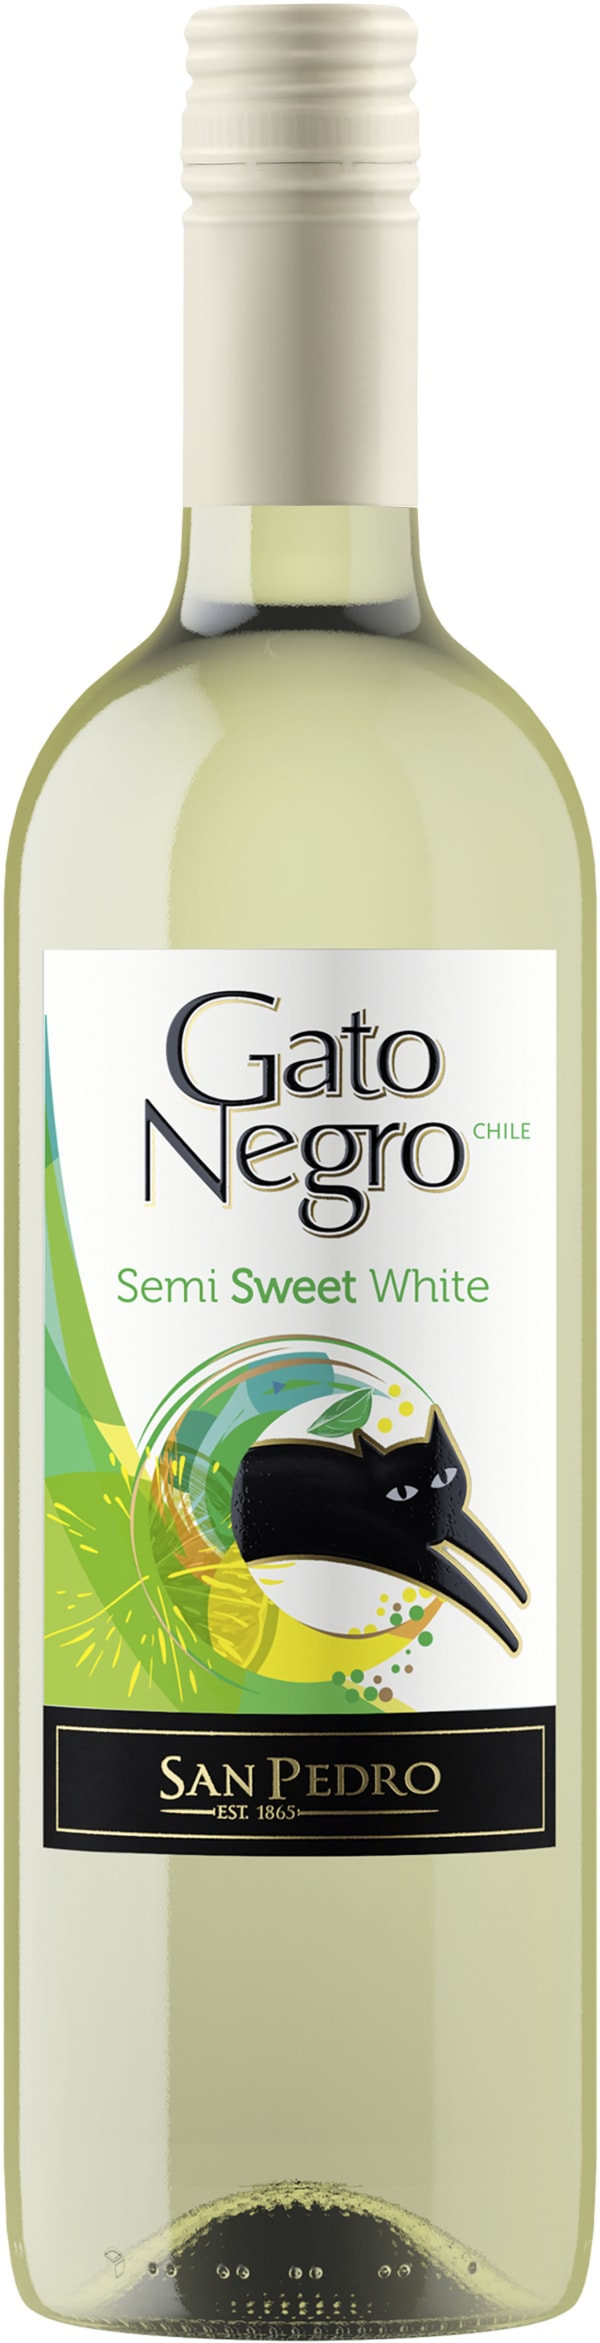 Gato Negro Semi Sweet White 2017